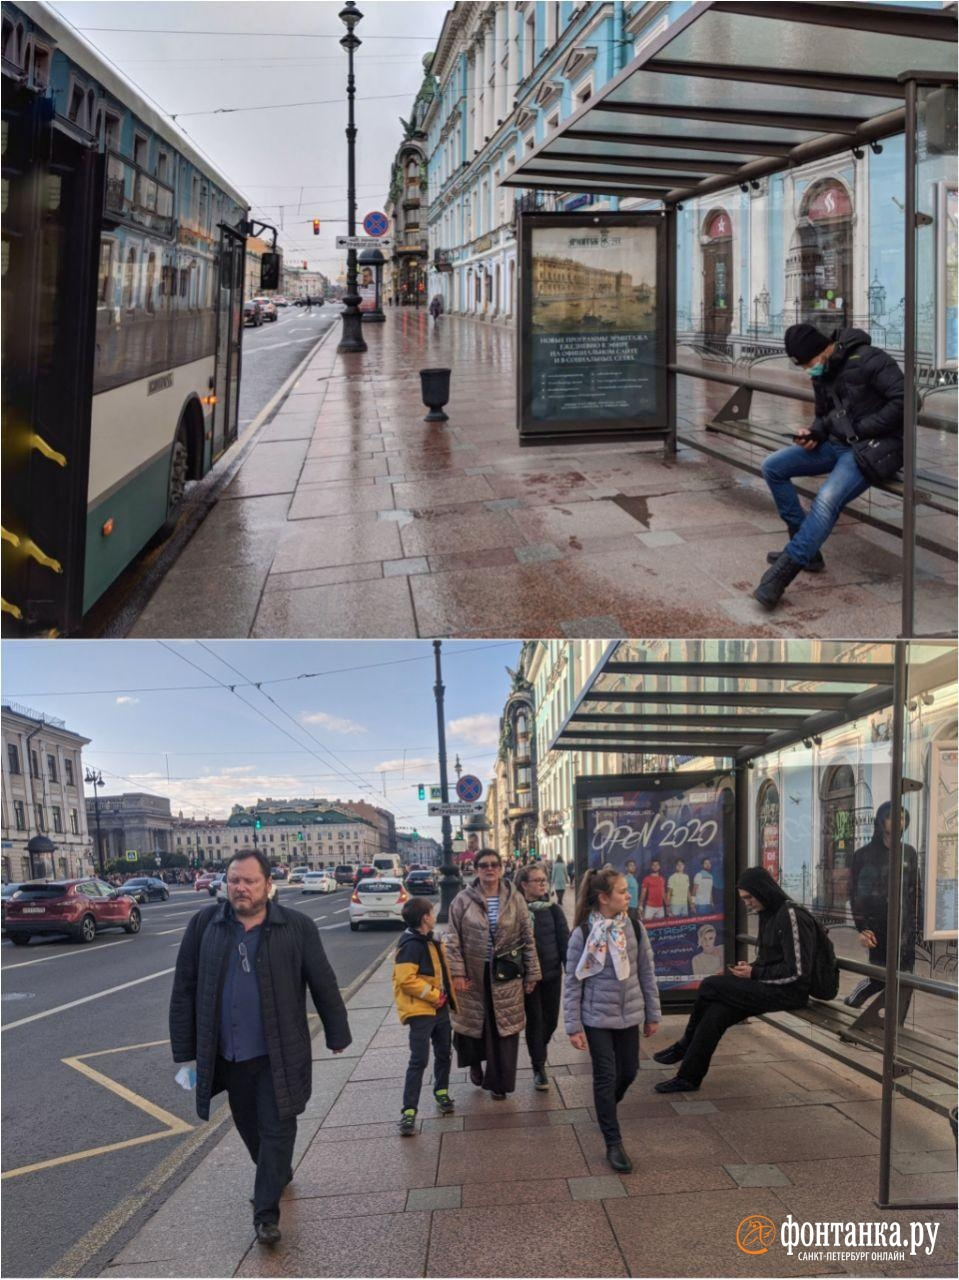 сверху: 6 апреля (+35 зараженных за сутки)&nbsp;<br>снизу: 10 октября (+500 зараженных за сутки)<br><br>автор фото Павел Каравашкин/«Фонтанка.ру»<br>